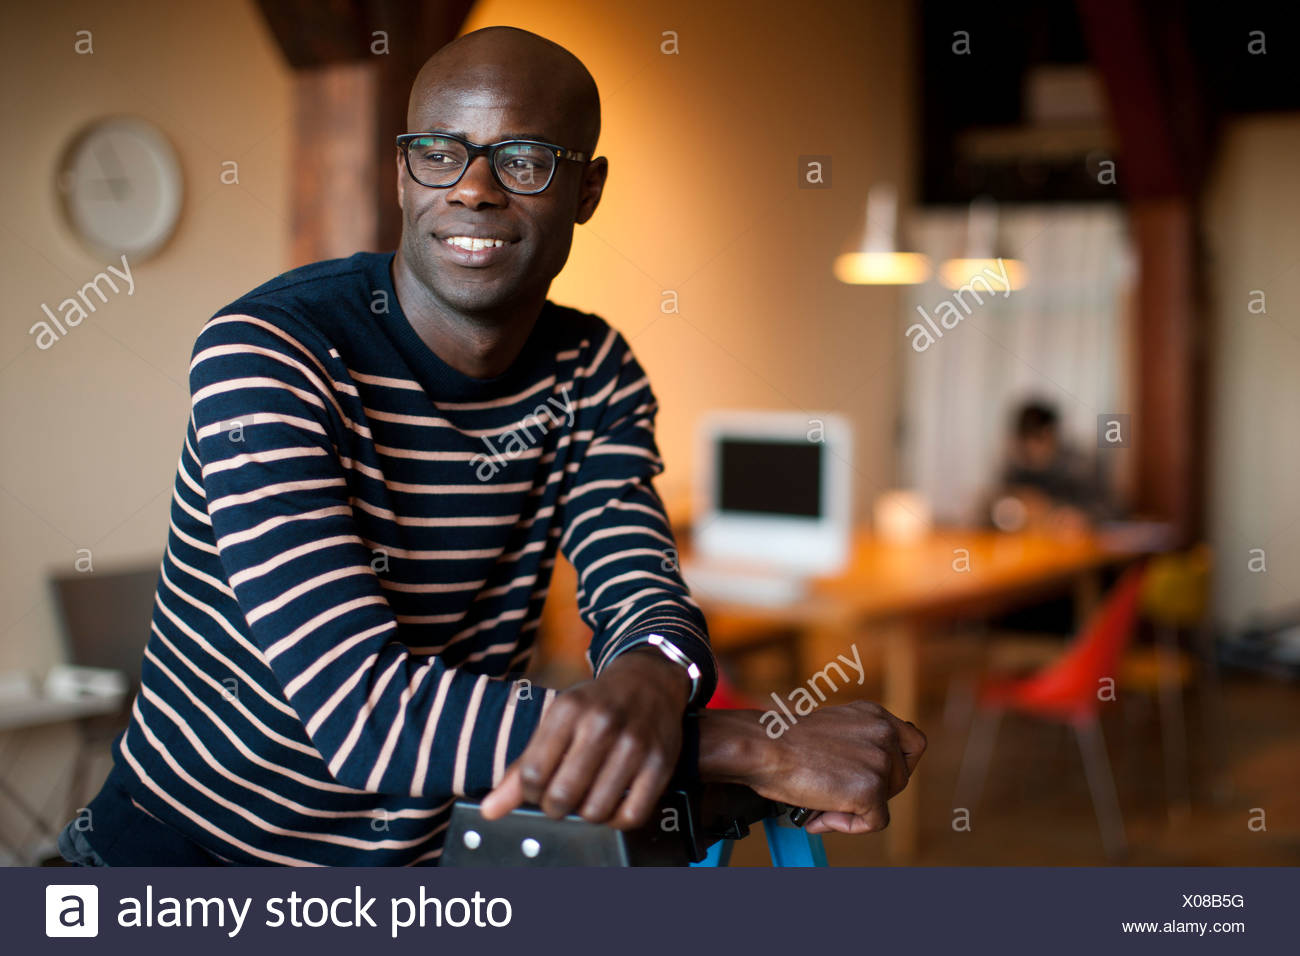 Smiling man leaning on luggage - Stock Image